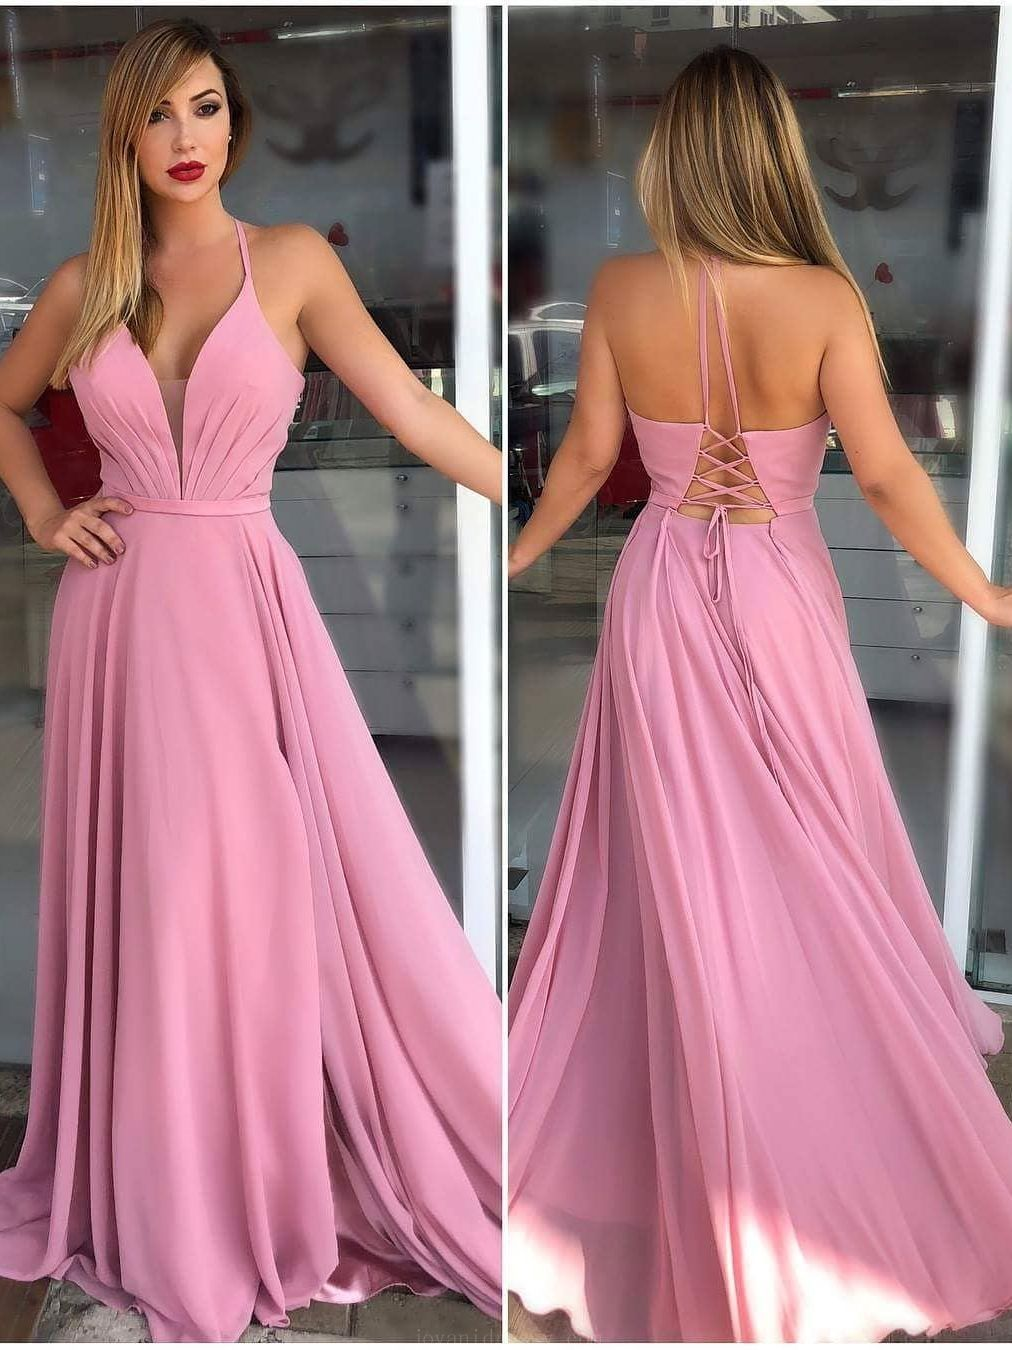 2018 Prom Dresses  2018PromDresses 93429c8d8760